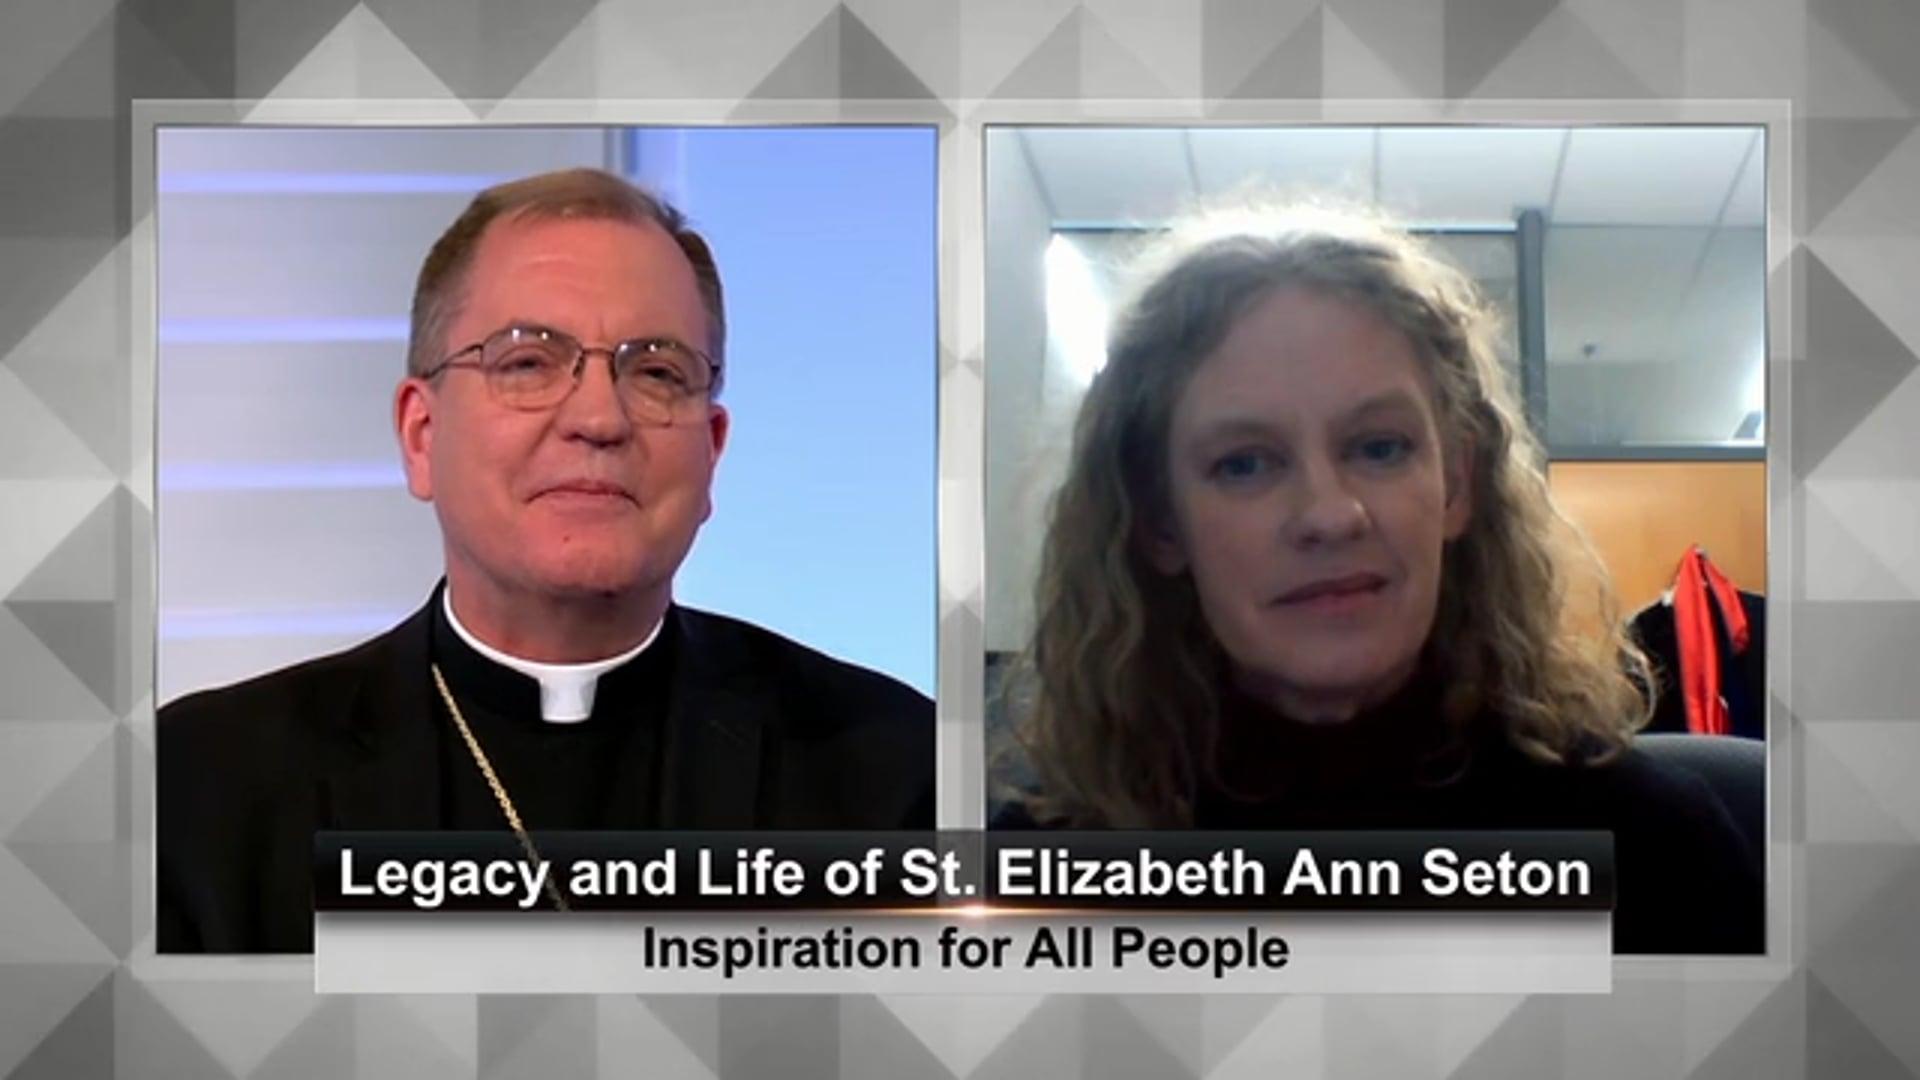 Encounter - The Life of St. Elizabeth Ann Seton, Part 1